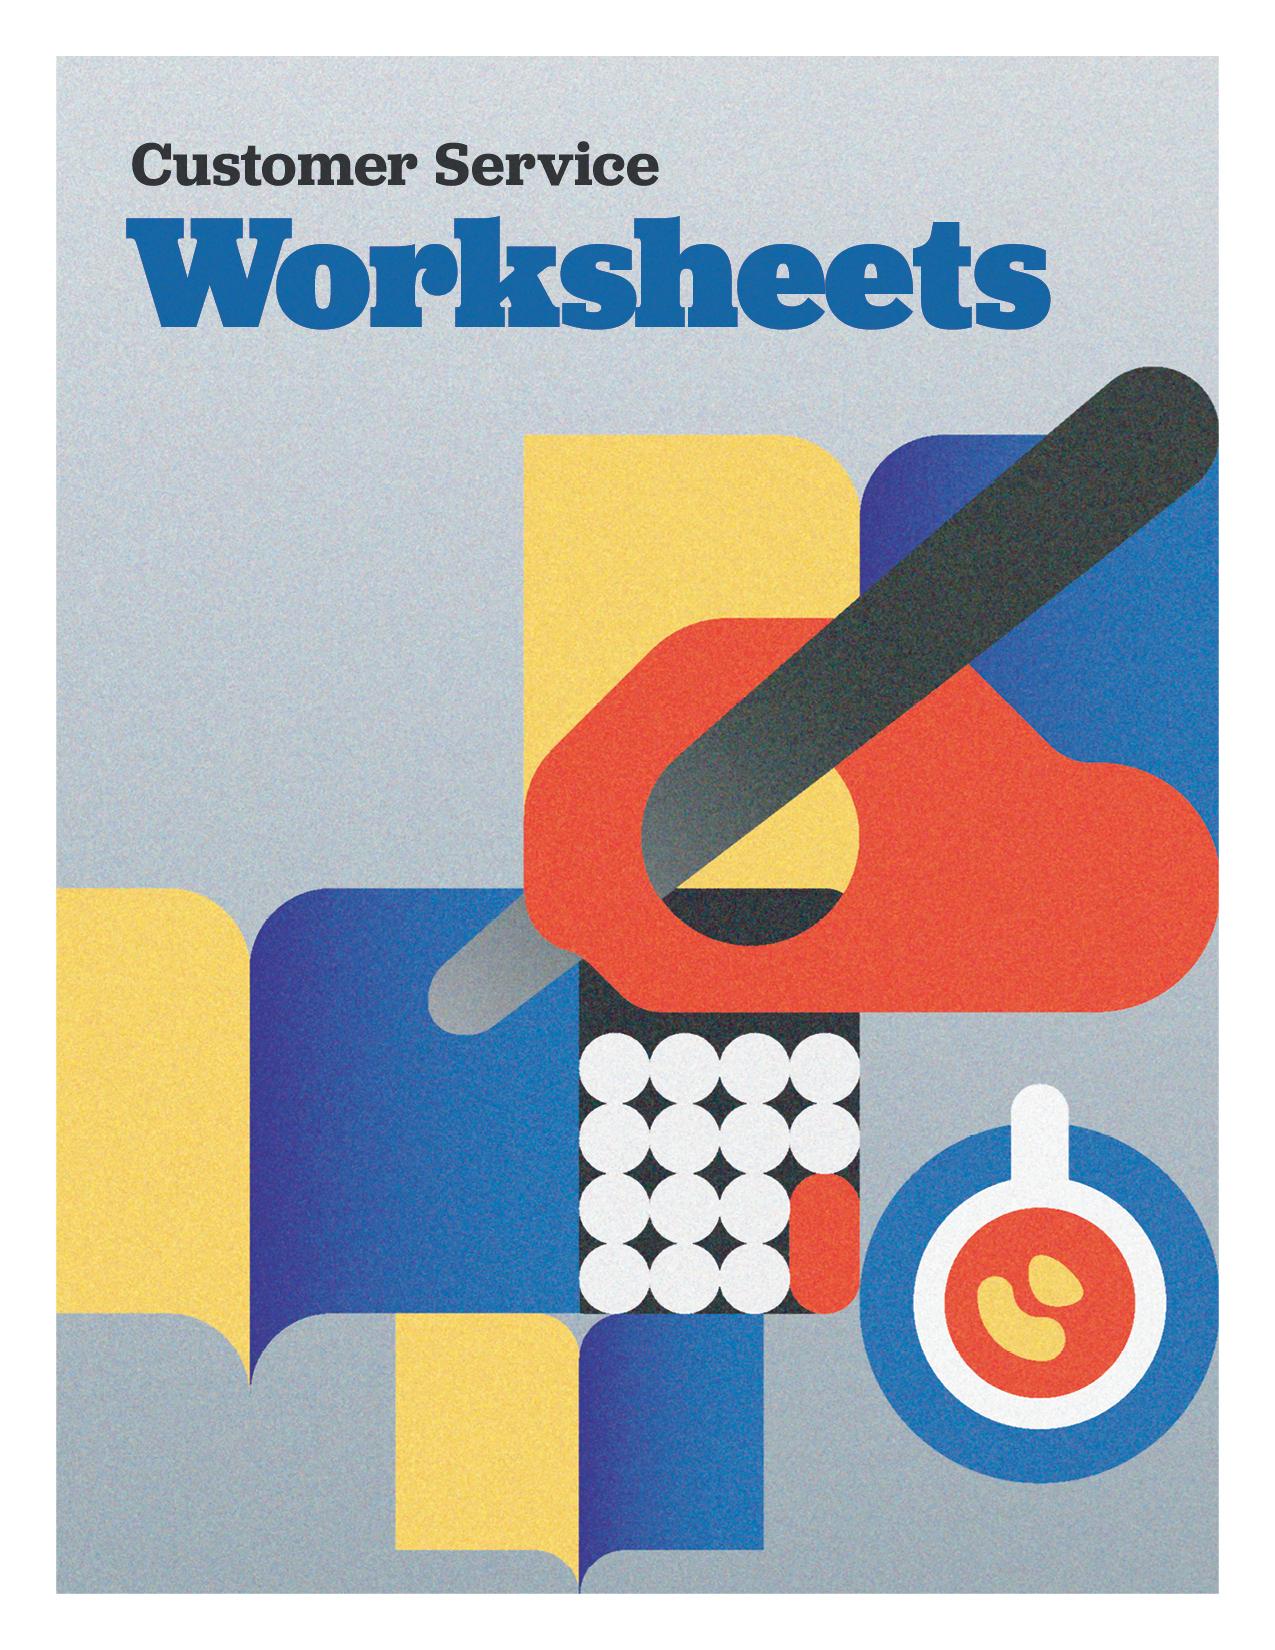 Customer Service Worksheets Resources